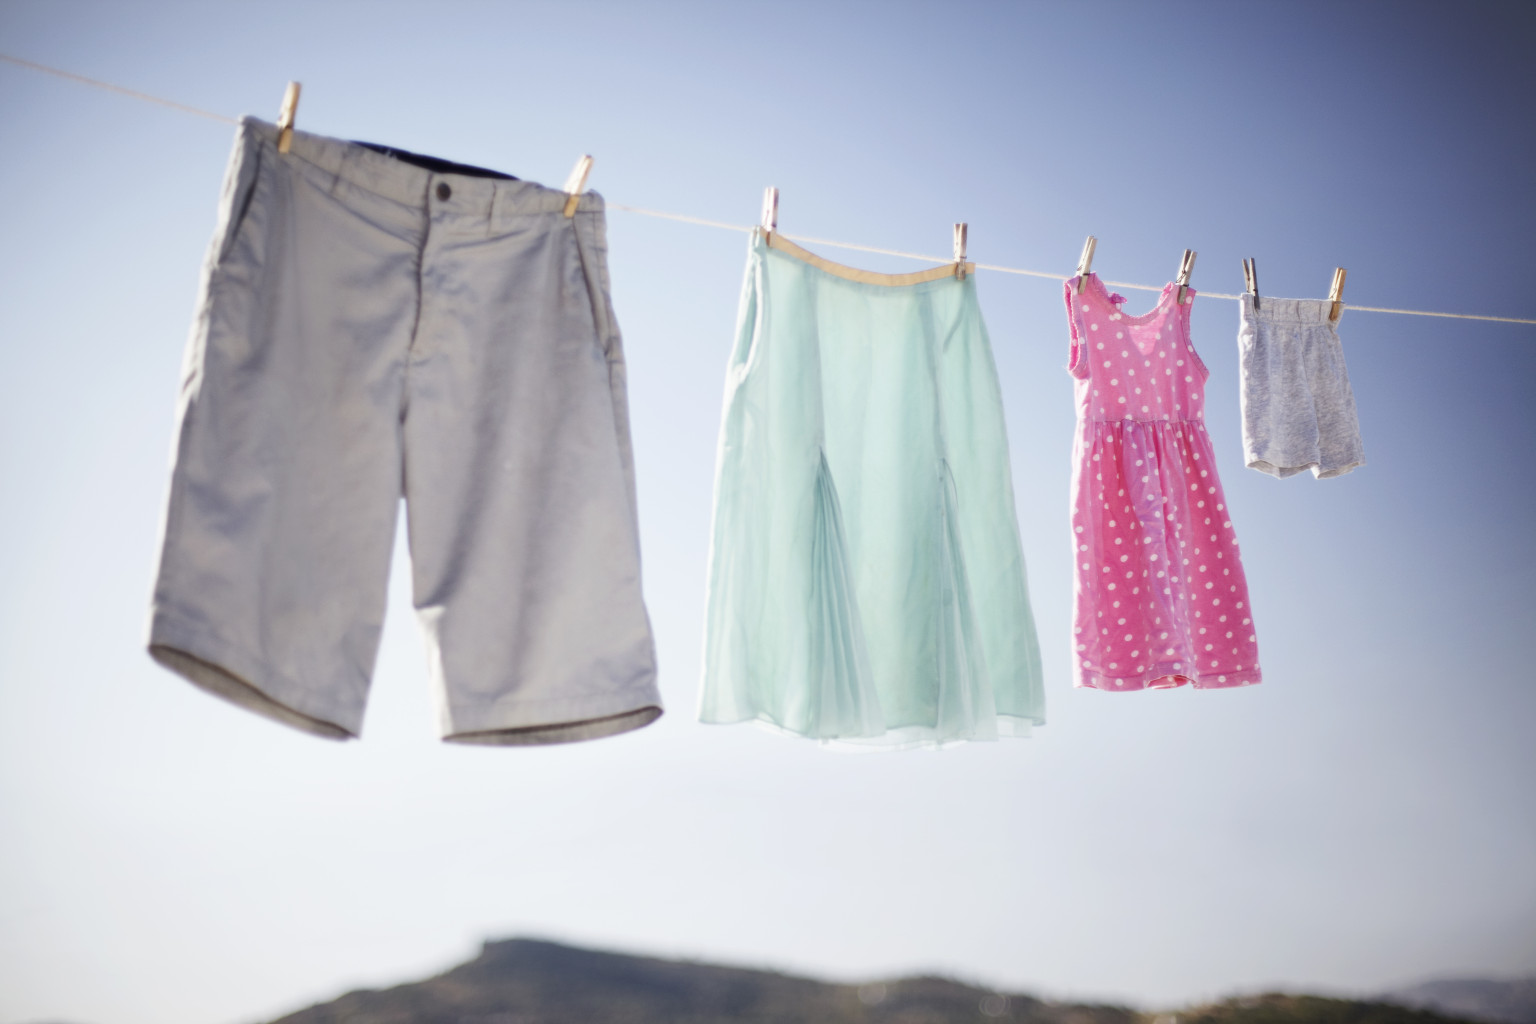 The Clothesline Ron Spangler